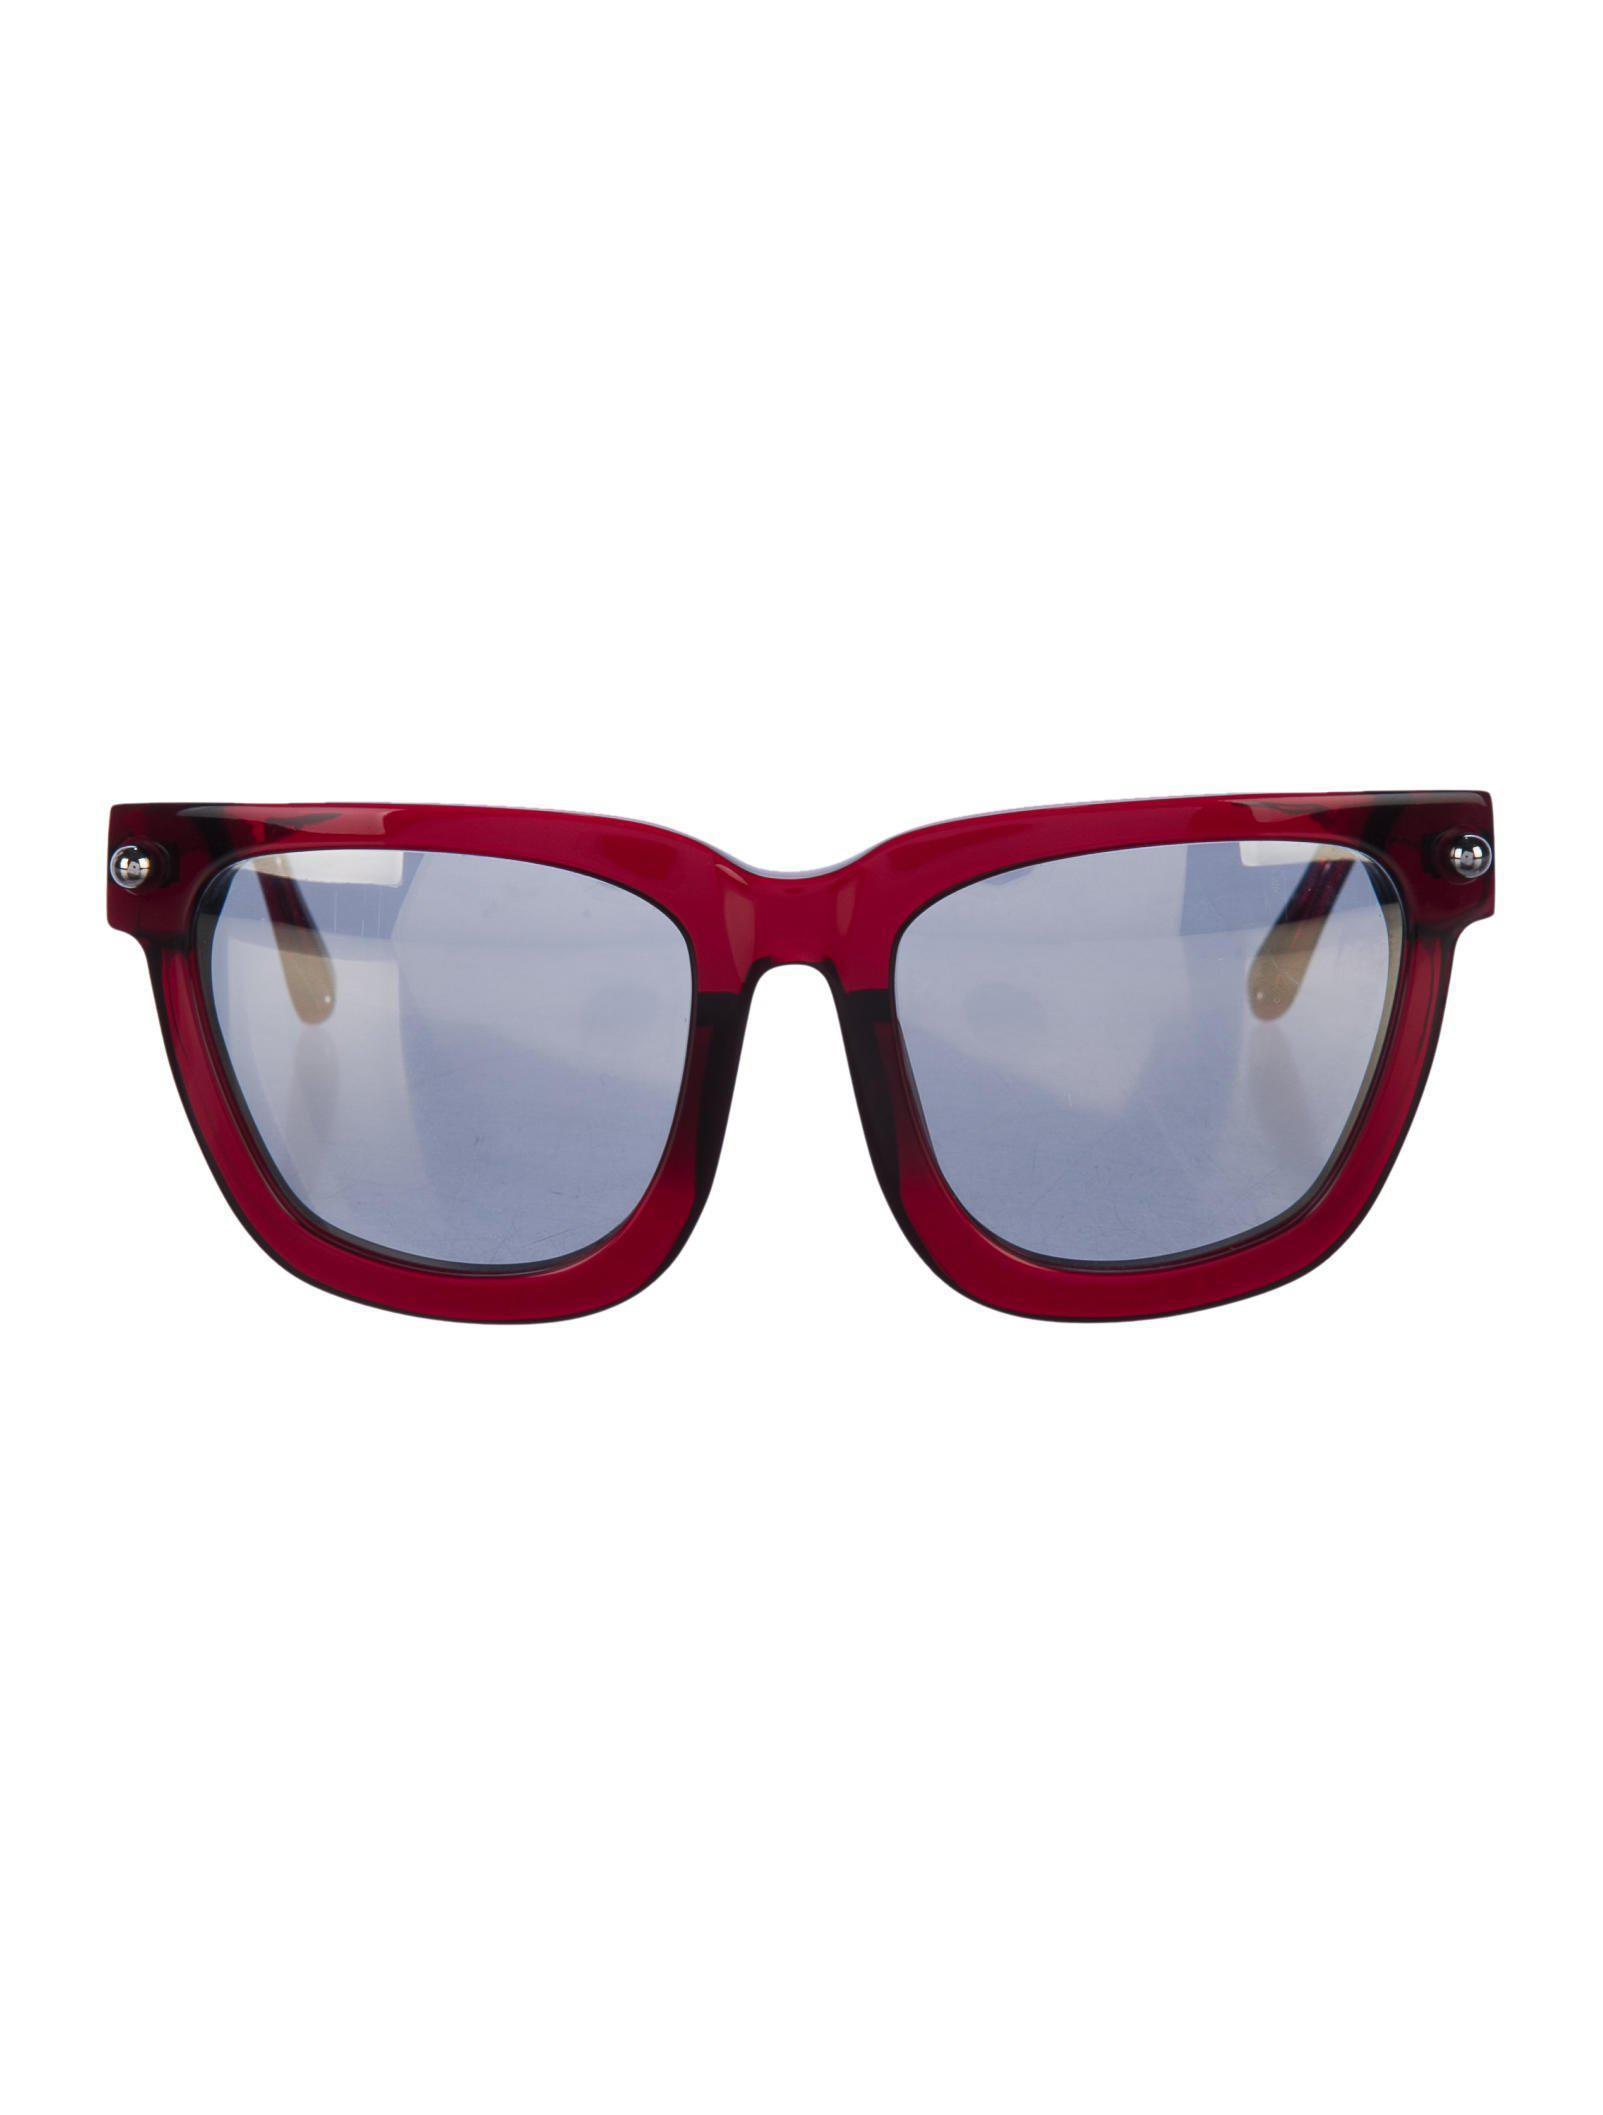 0fc99def829e Lyst - Alexander Wang Tinted Wayfarer Sunglasses Silver in Metallic